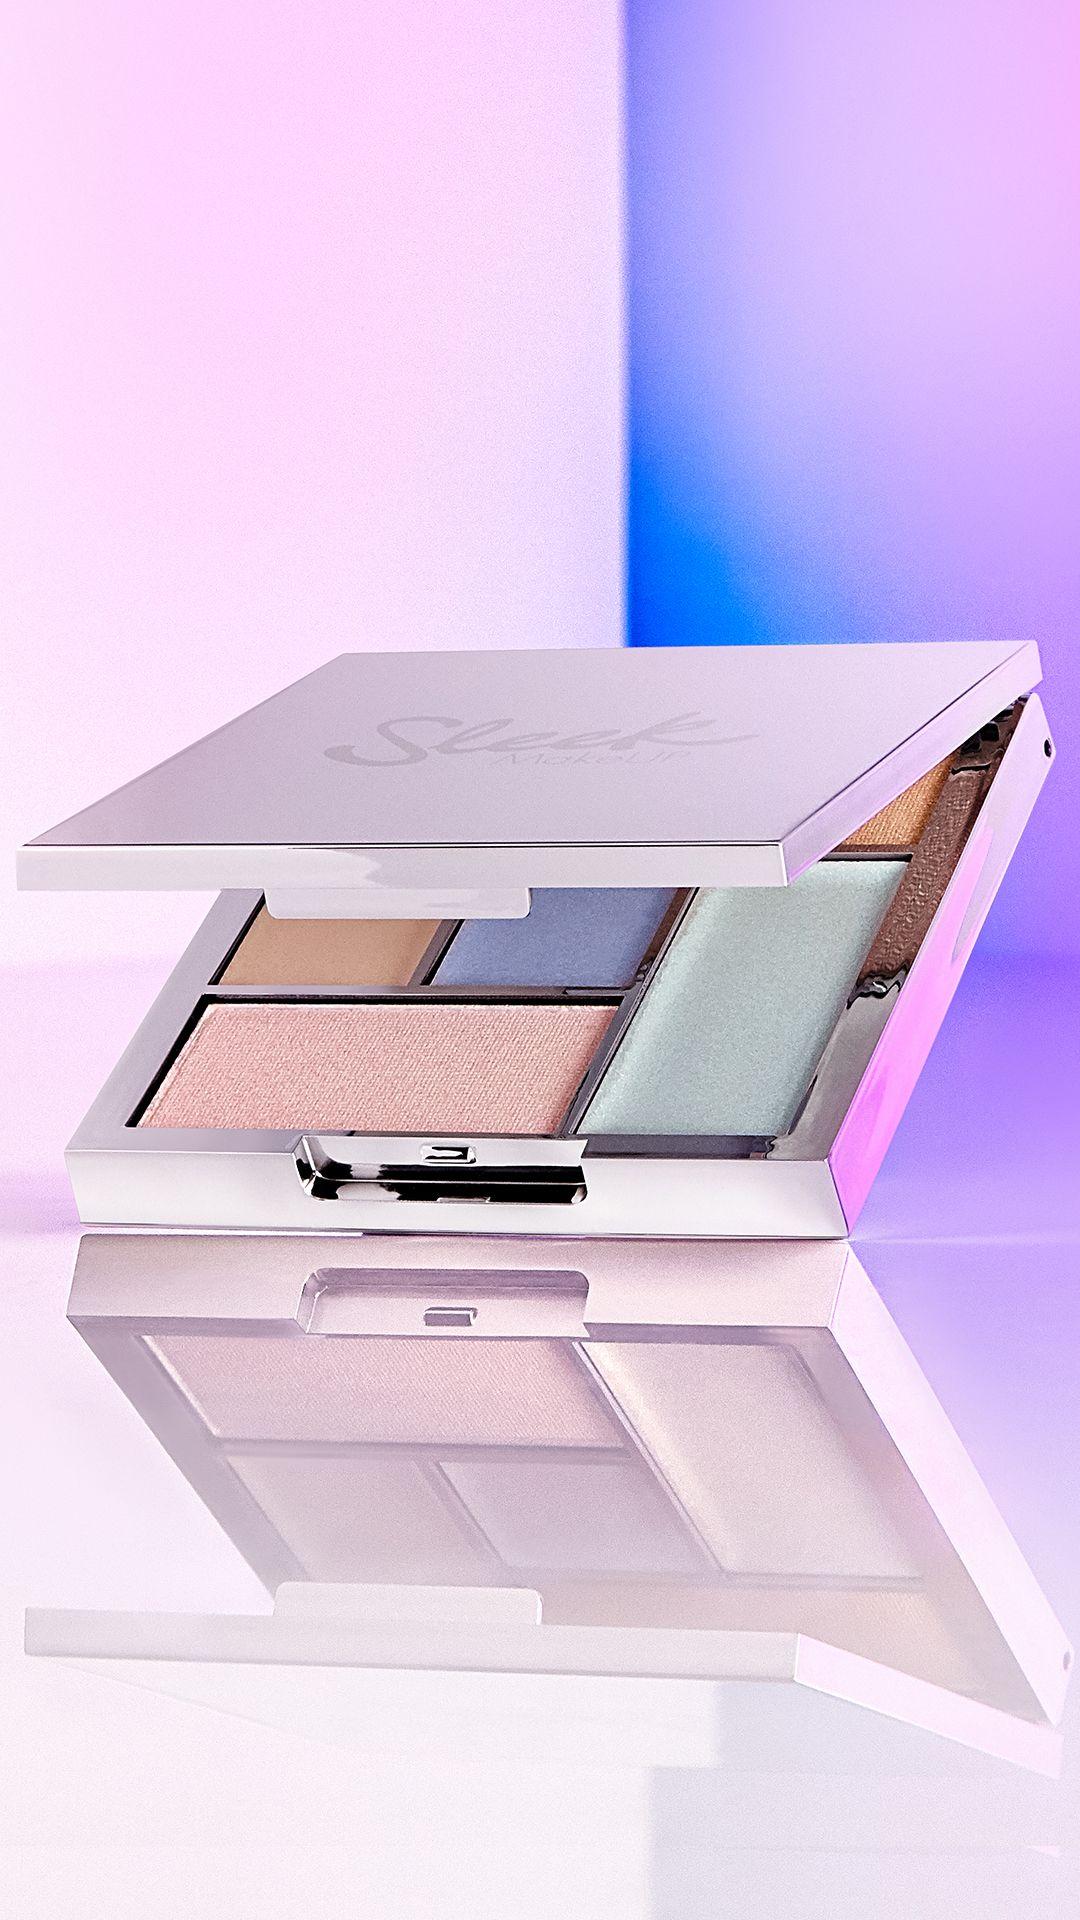 british beauty cosmetics brand sleek makeup distorted